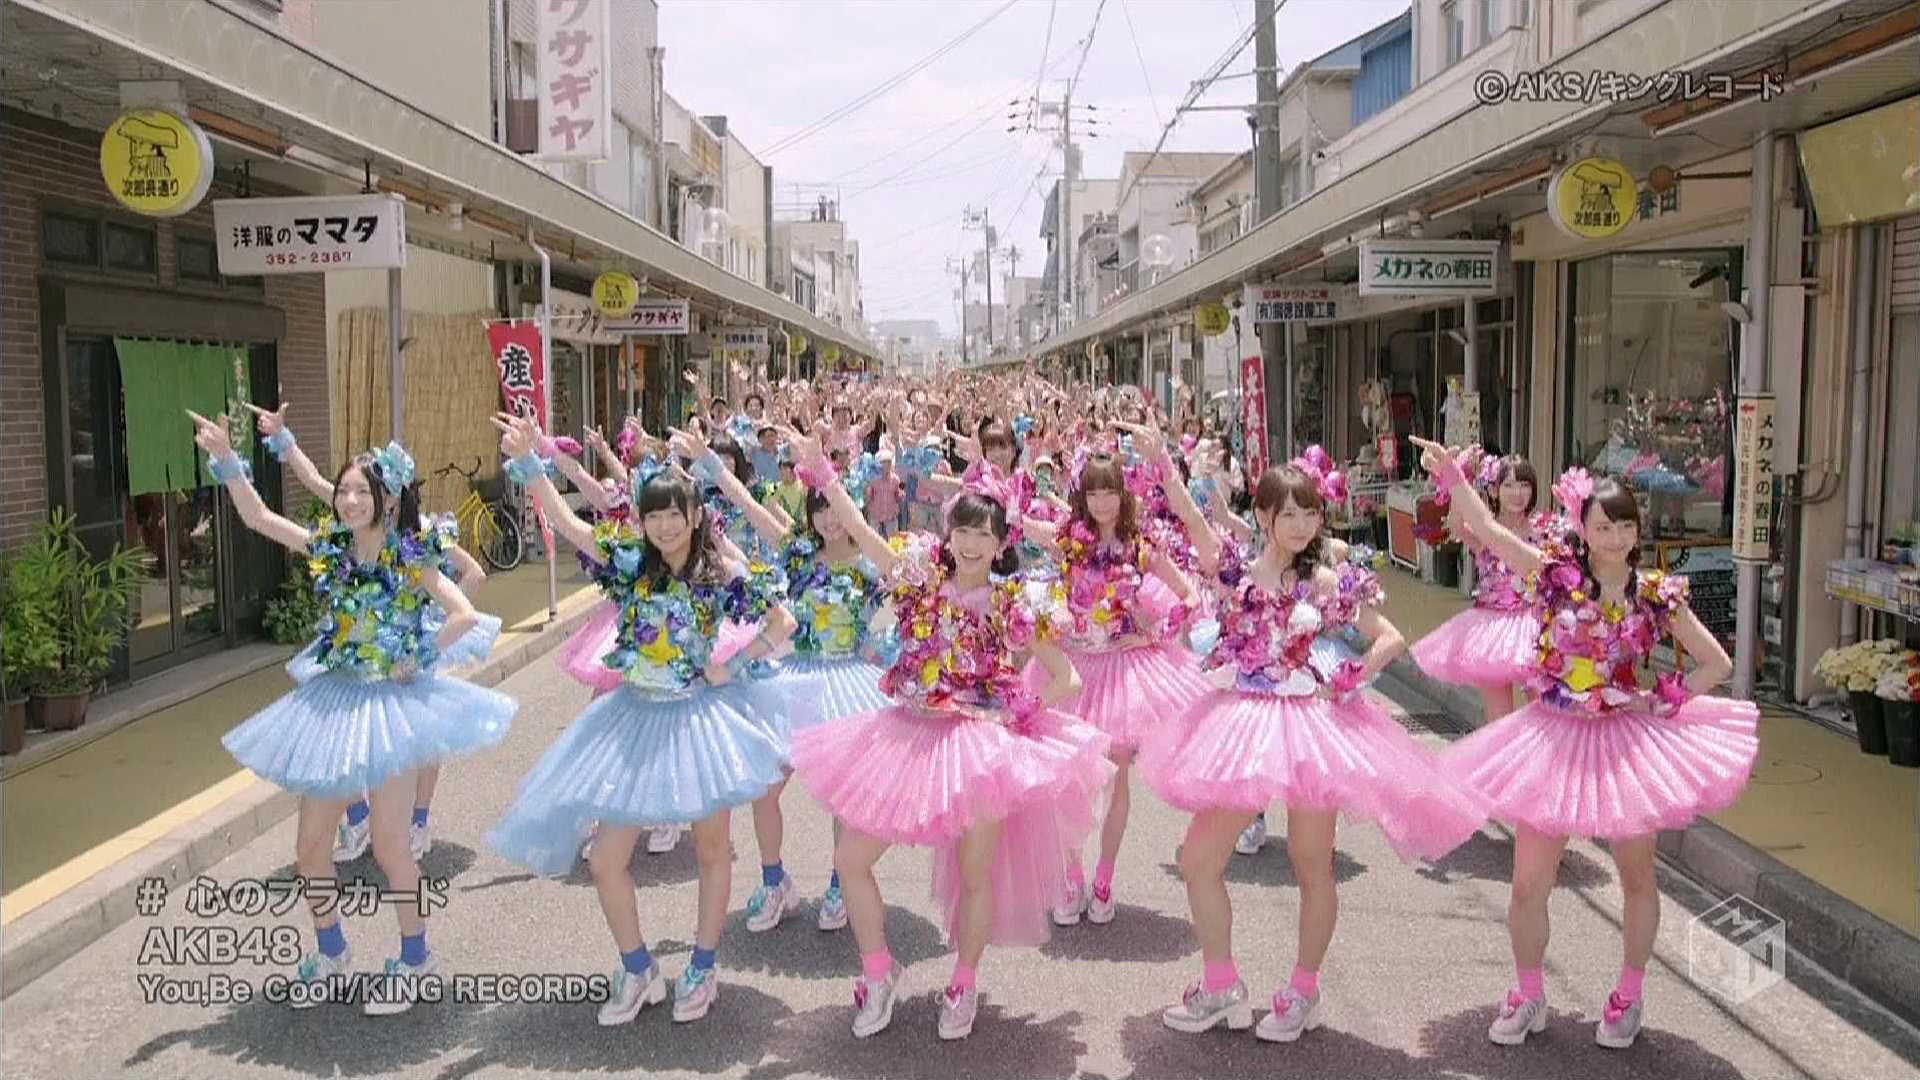 fumi Diary 2号店 : AKB48「心の...